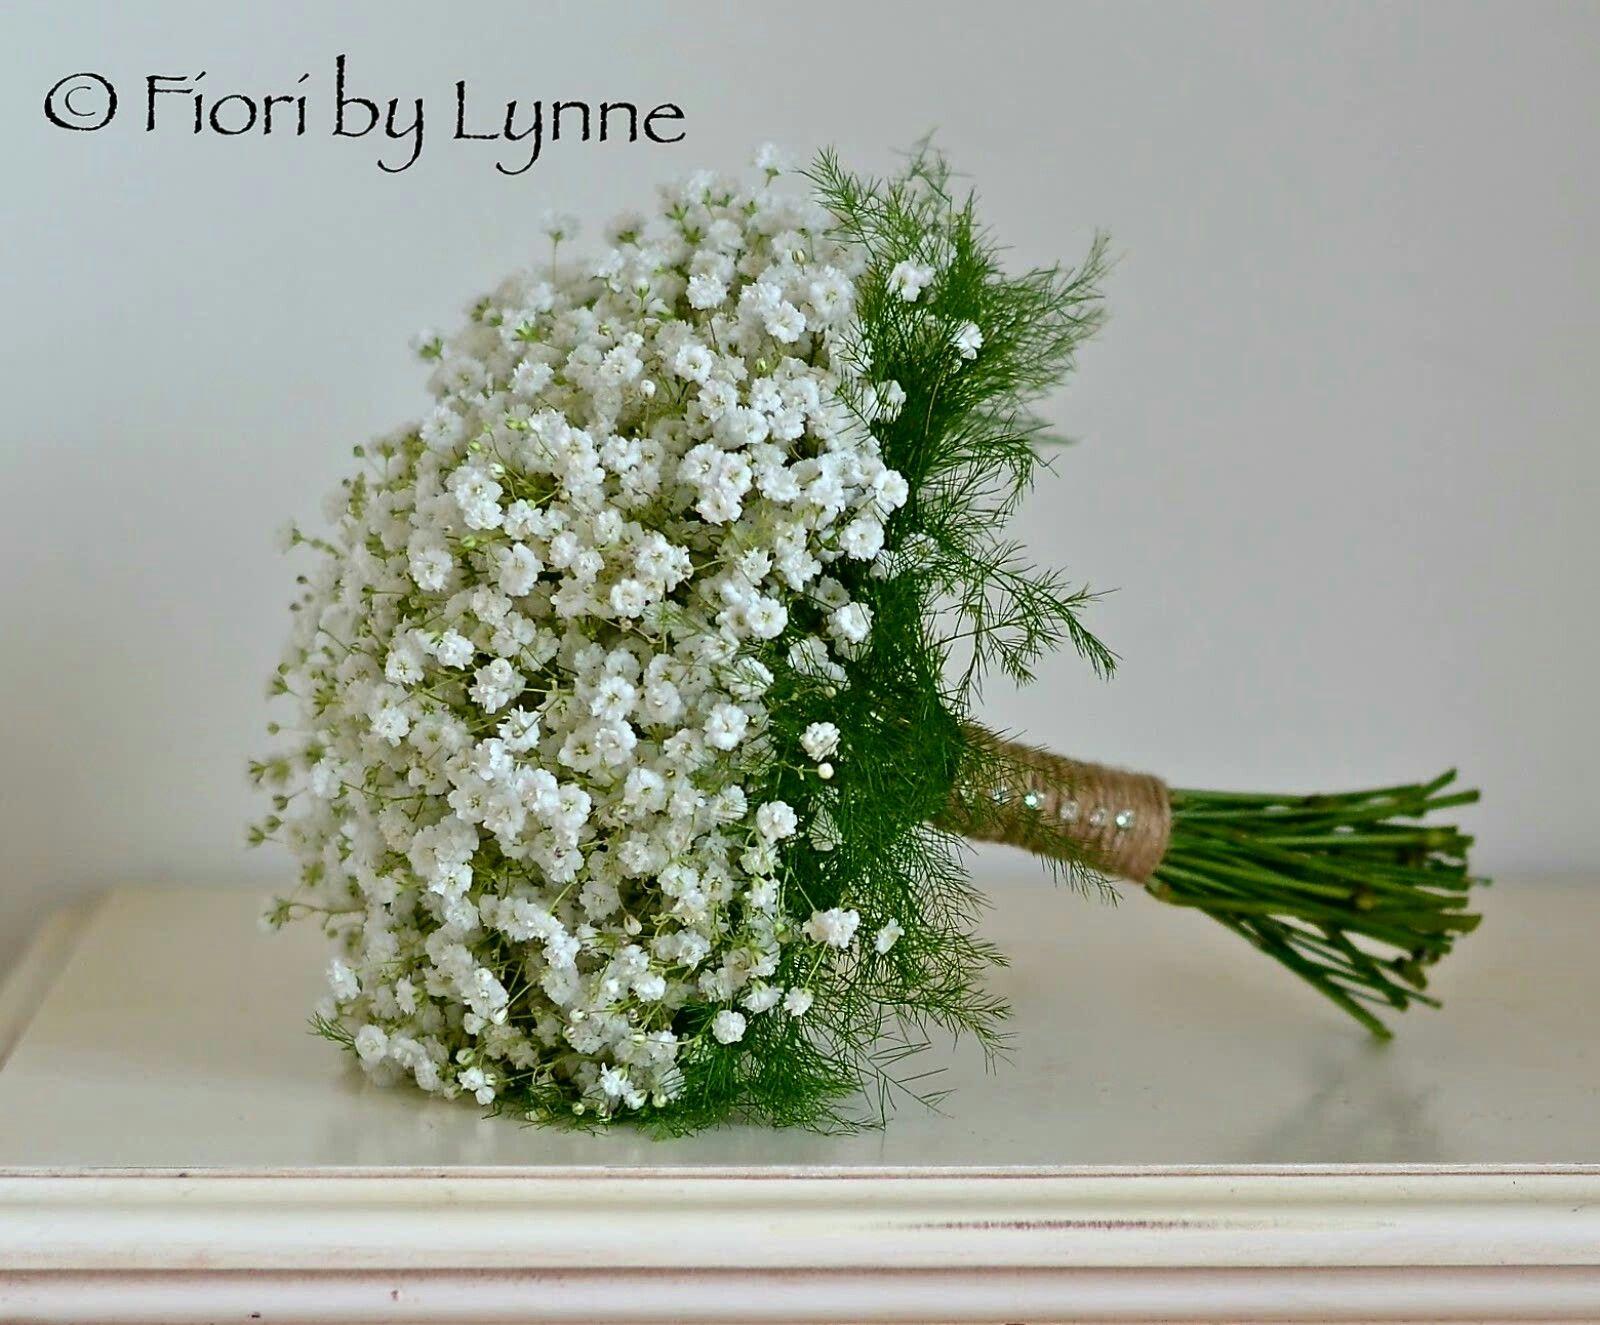 Rustic Hand Tied Wedding Bouquet Featuring White Gypsophila Baby S Breath Green Tree Fern Fo Wedding Flowers Gypsophila Wedding Flowers Gypsophila Bouquet